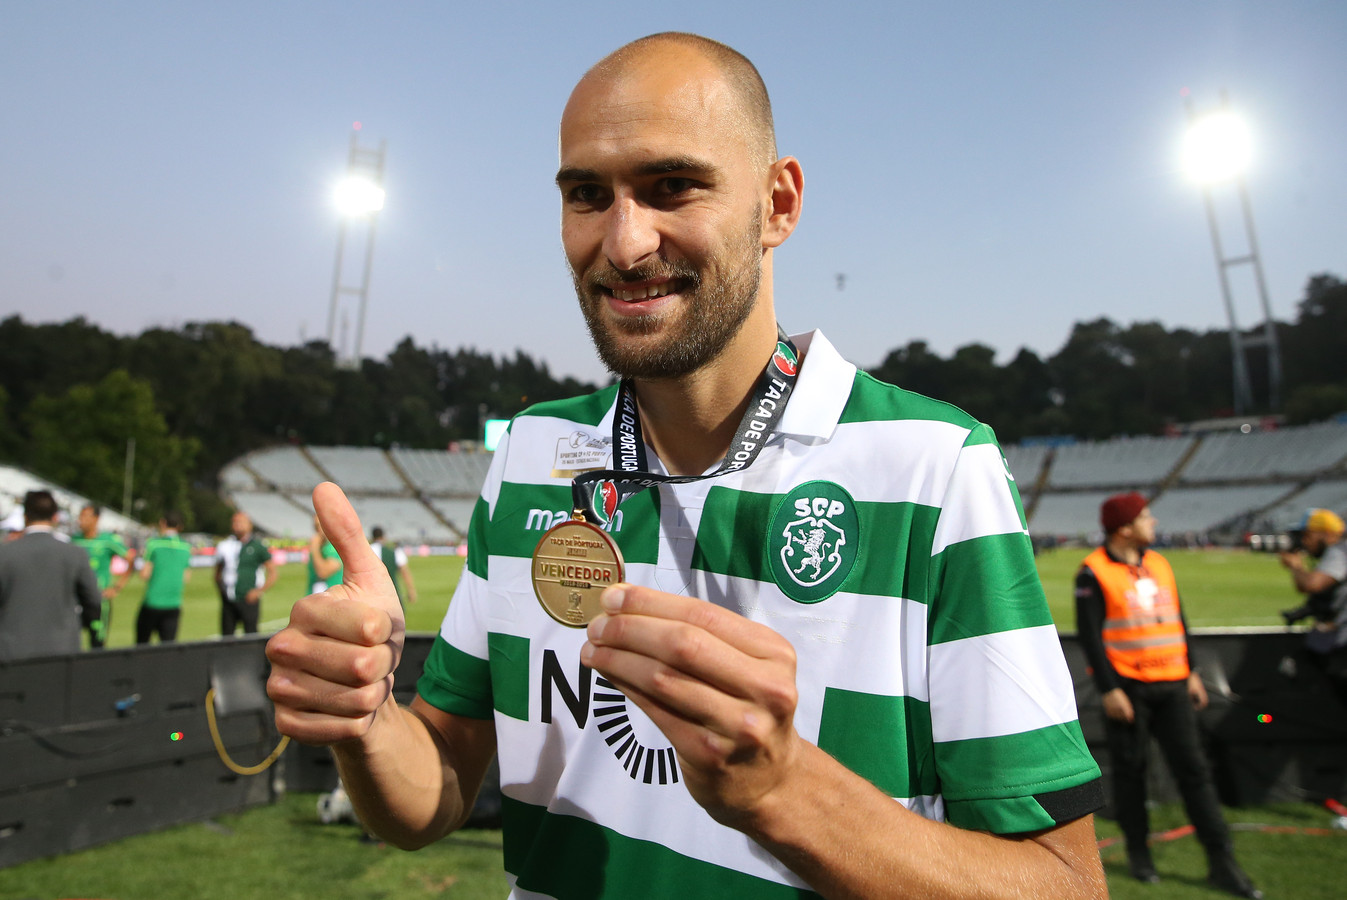 Bas Dost showt zijn medaille na de gewonnen bekerfinale tegen FC Porto.